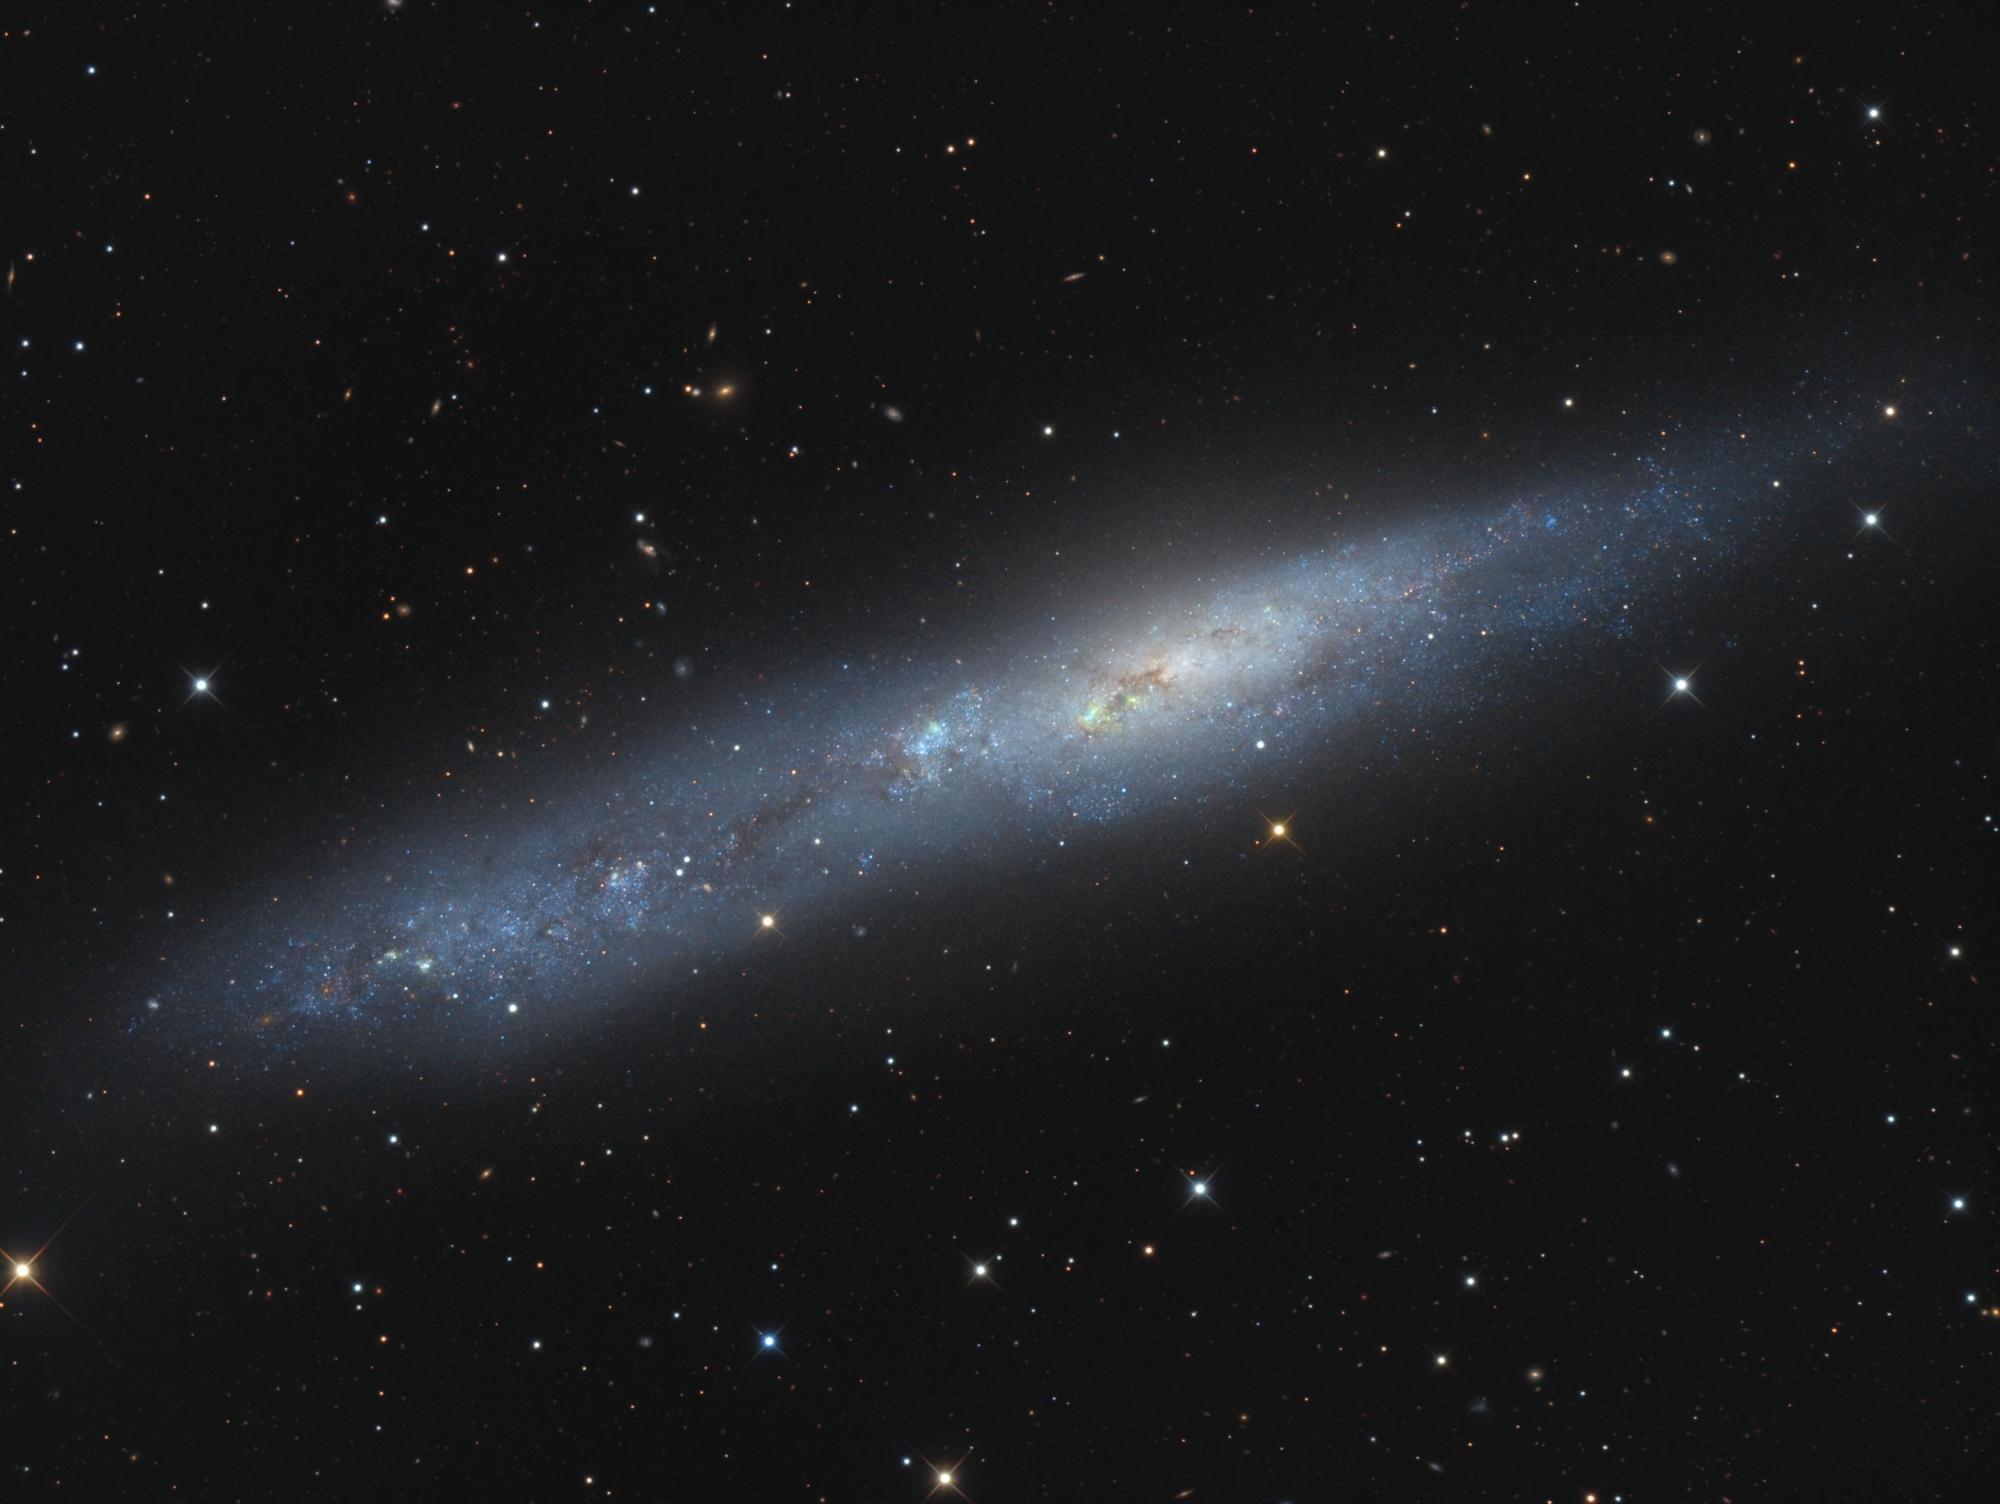 NGC55-LRVB-V3-publi.thumb.jpg.74d12c5f80ea29520125c059d1a1520c.jpg